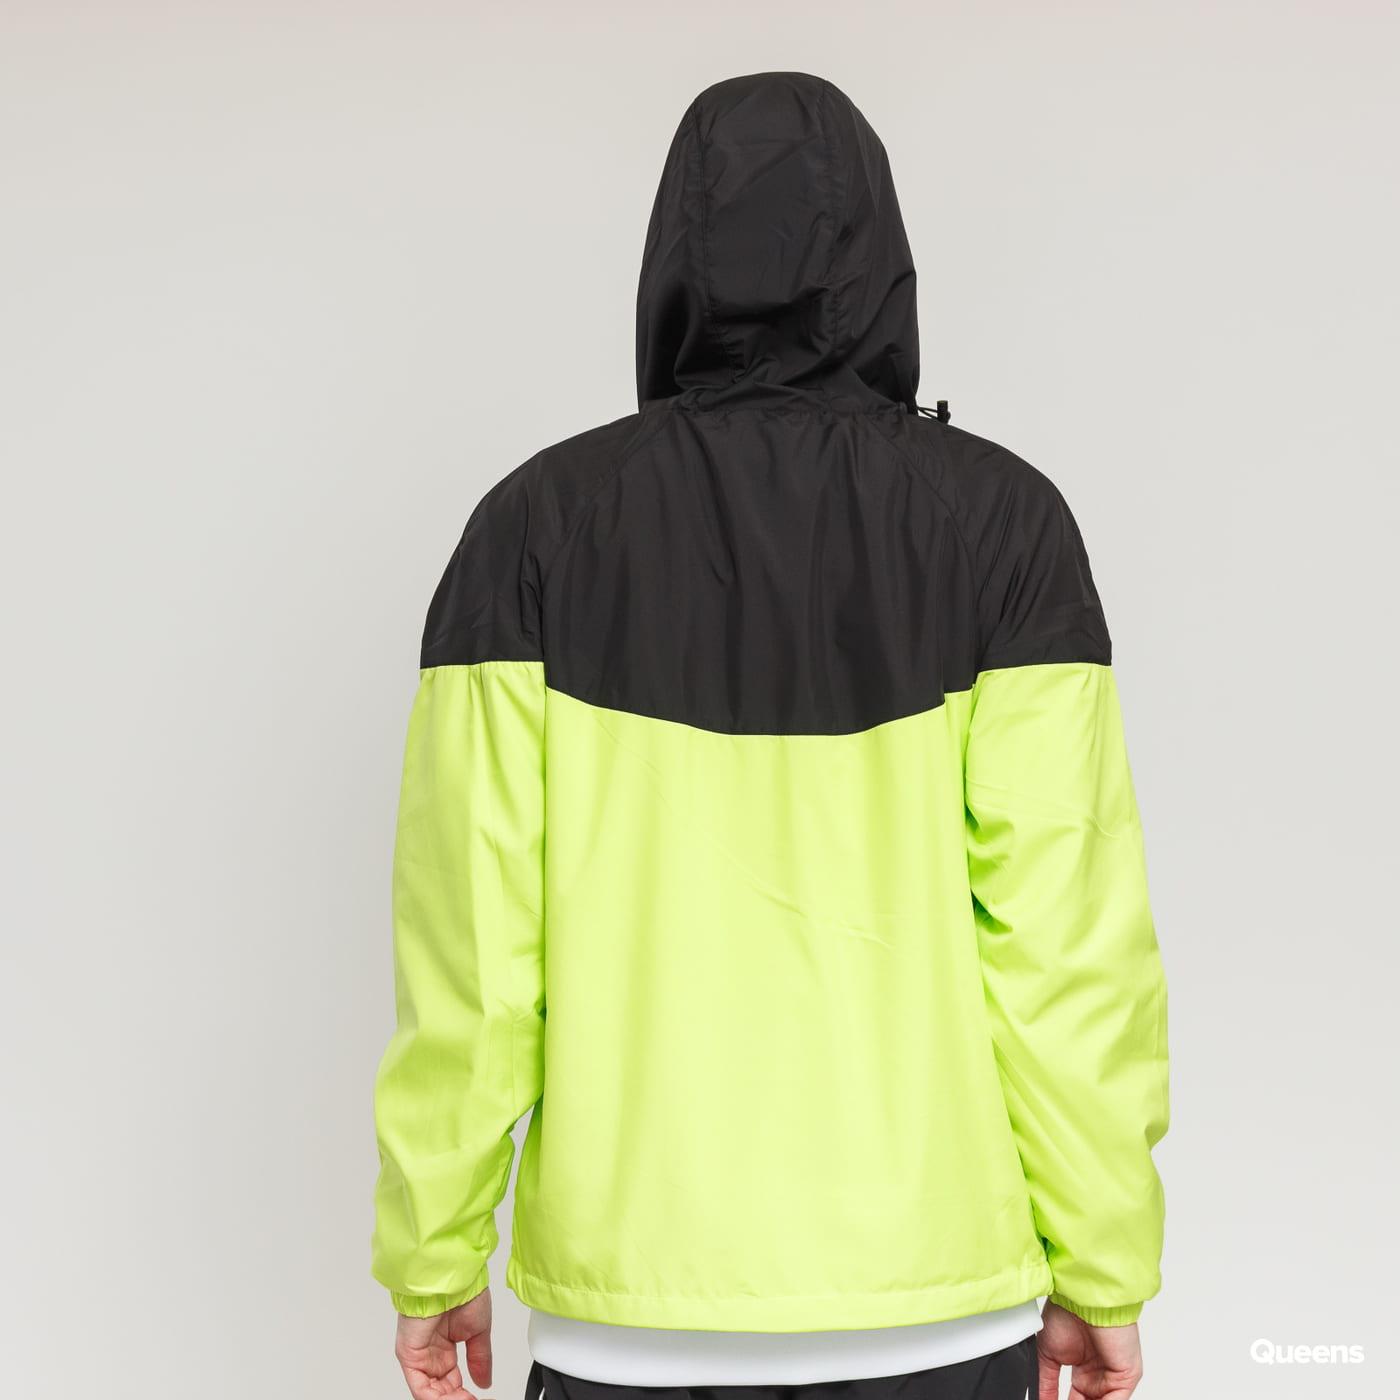 Urban Classics 2-Tone Tech Windrunner gelbgrün / schwarz